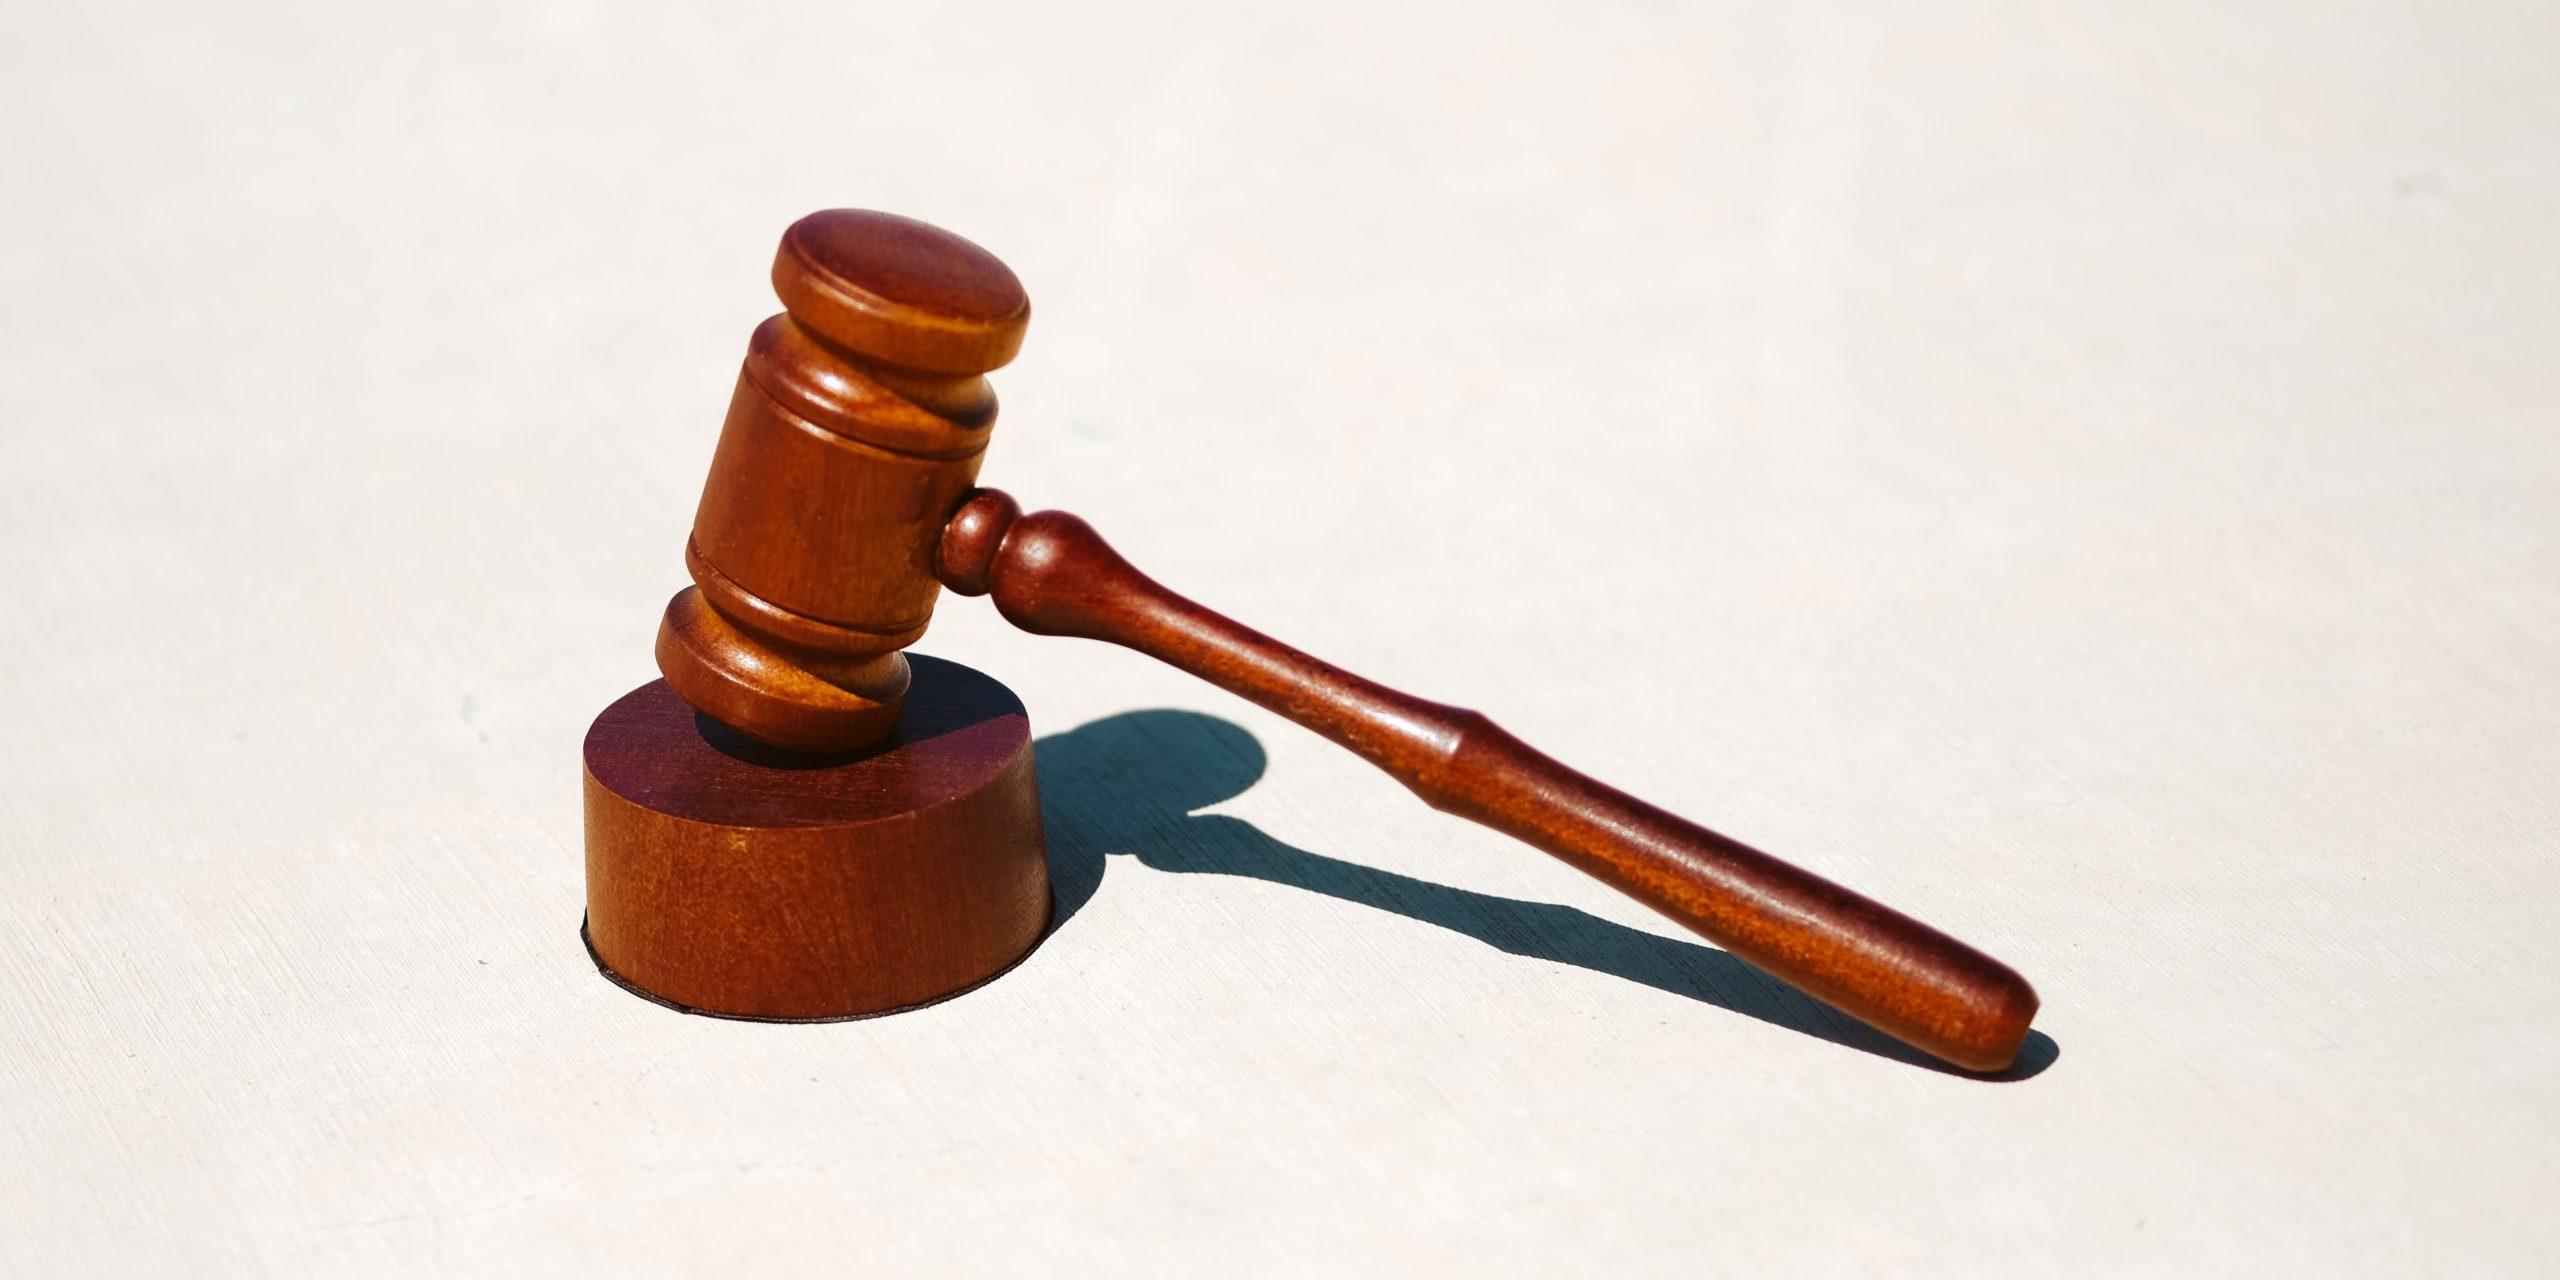 tingey-injury-law-firm-veNb0DDegzE-unsplash